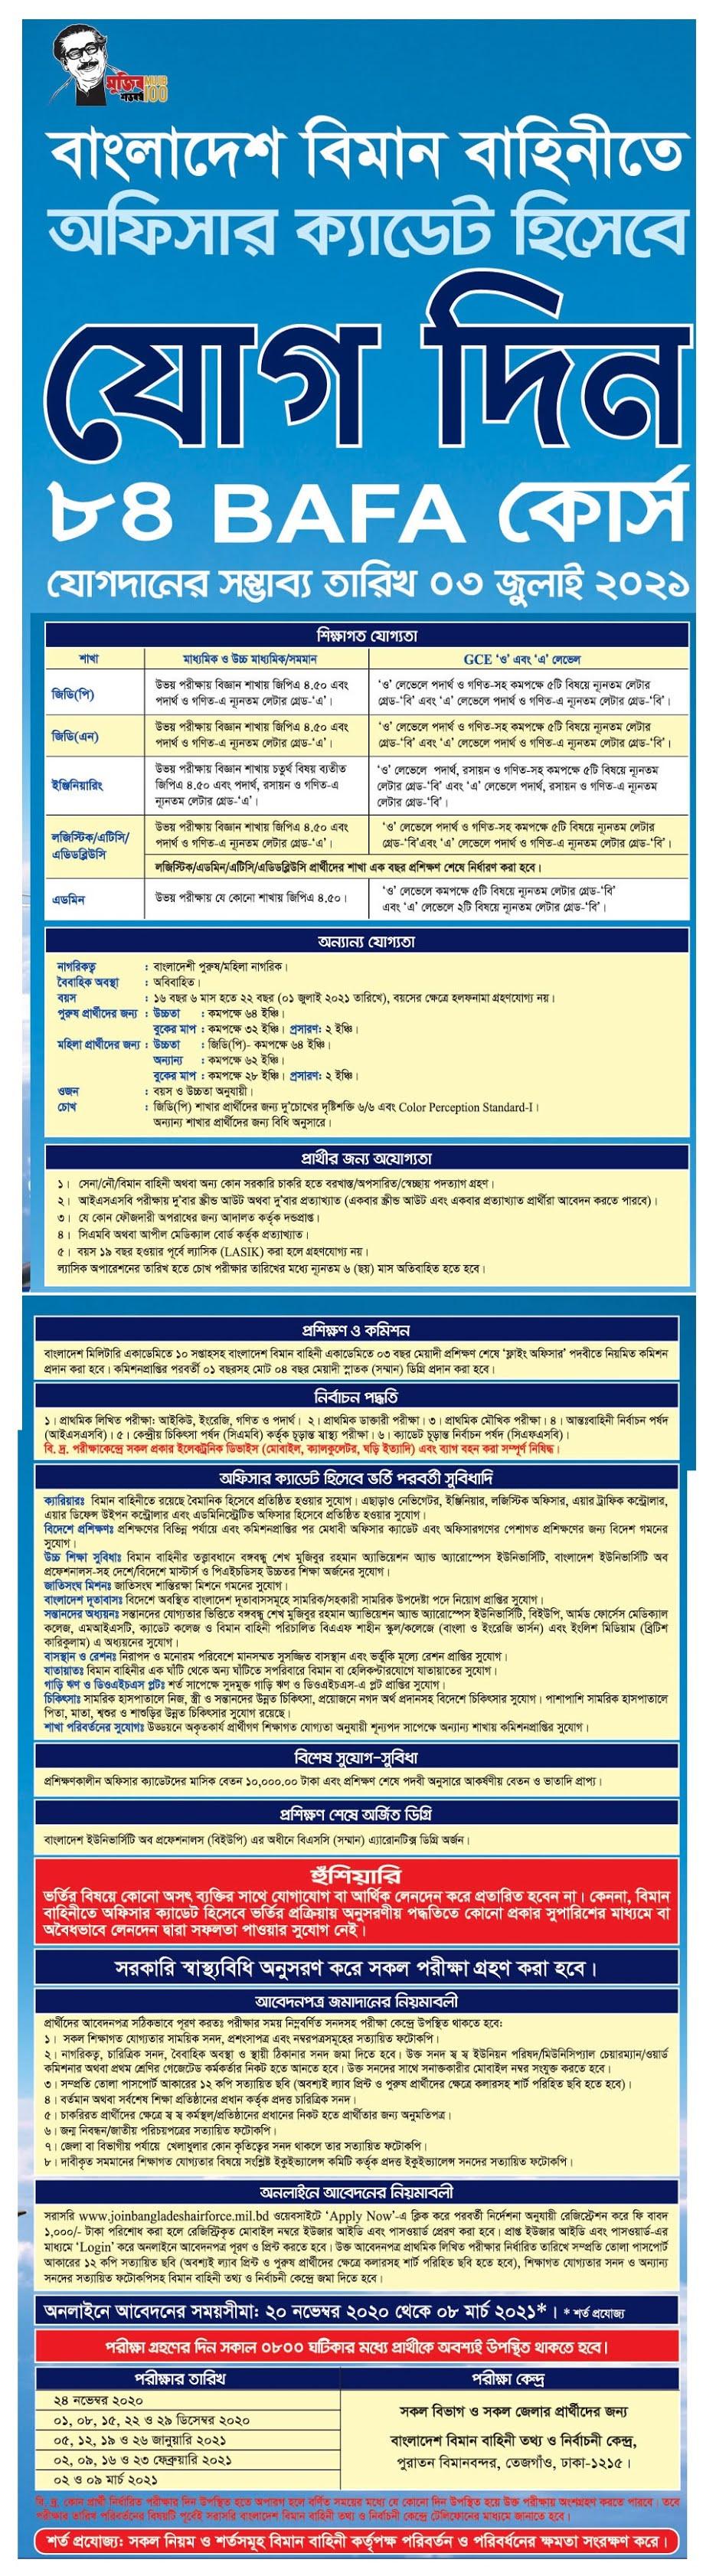 bangladesh air force circular 2020